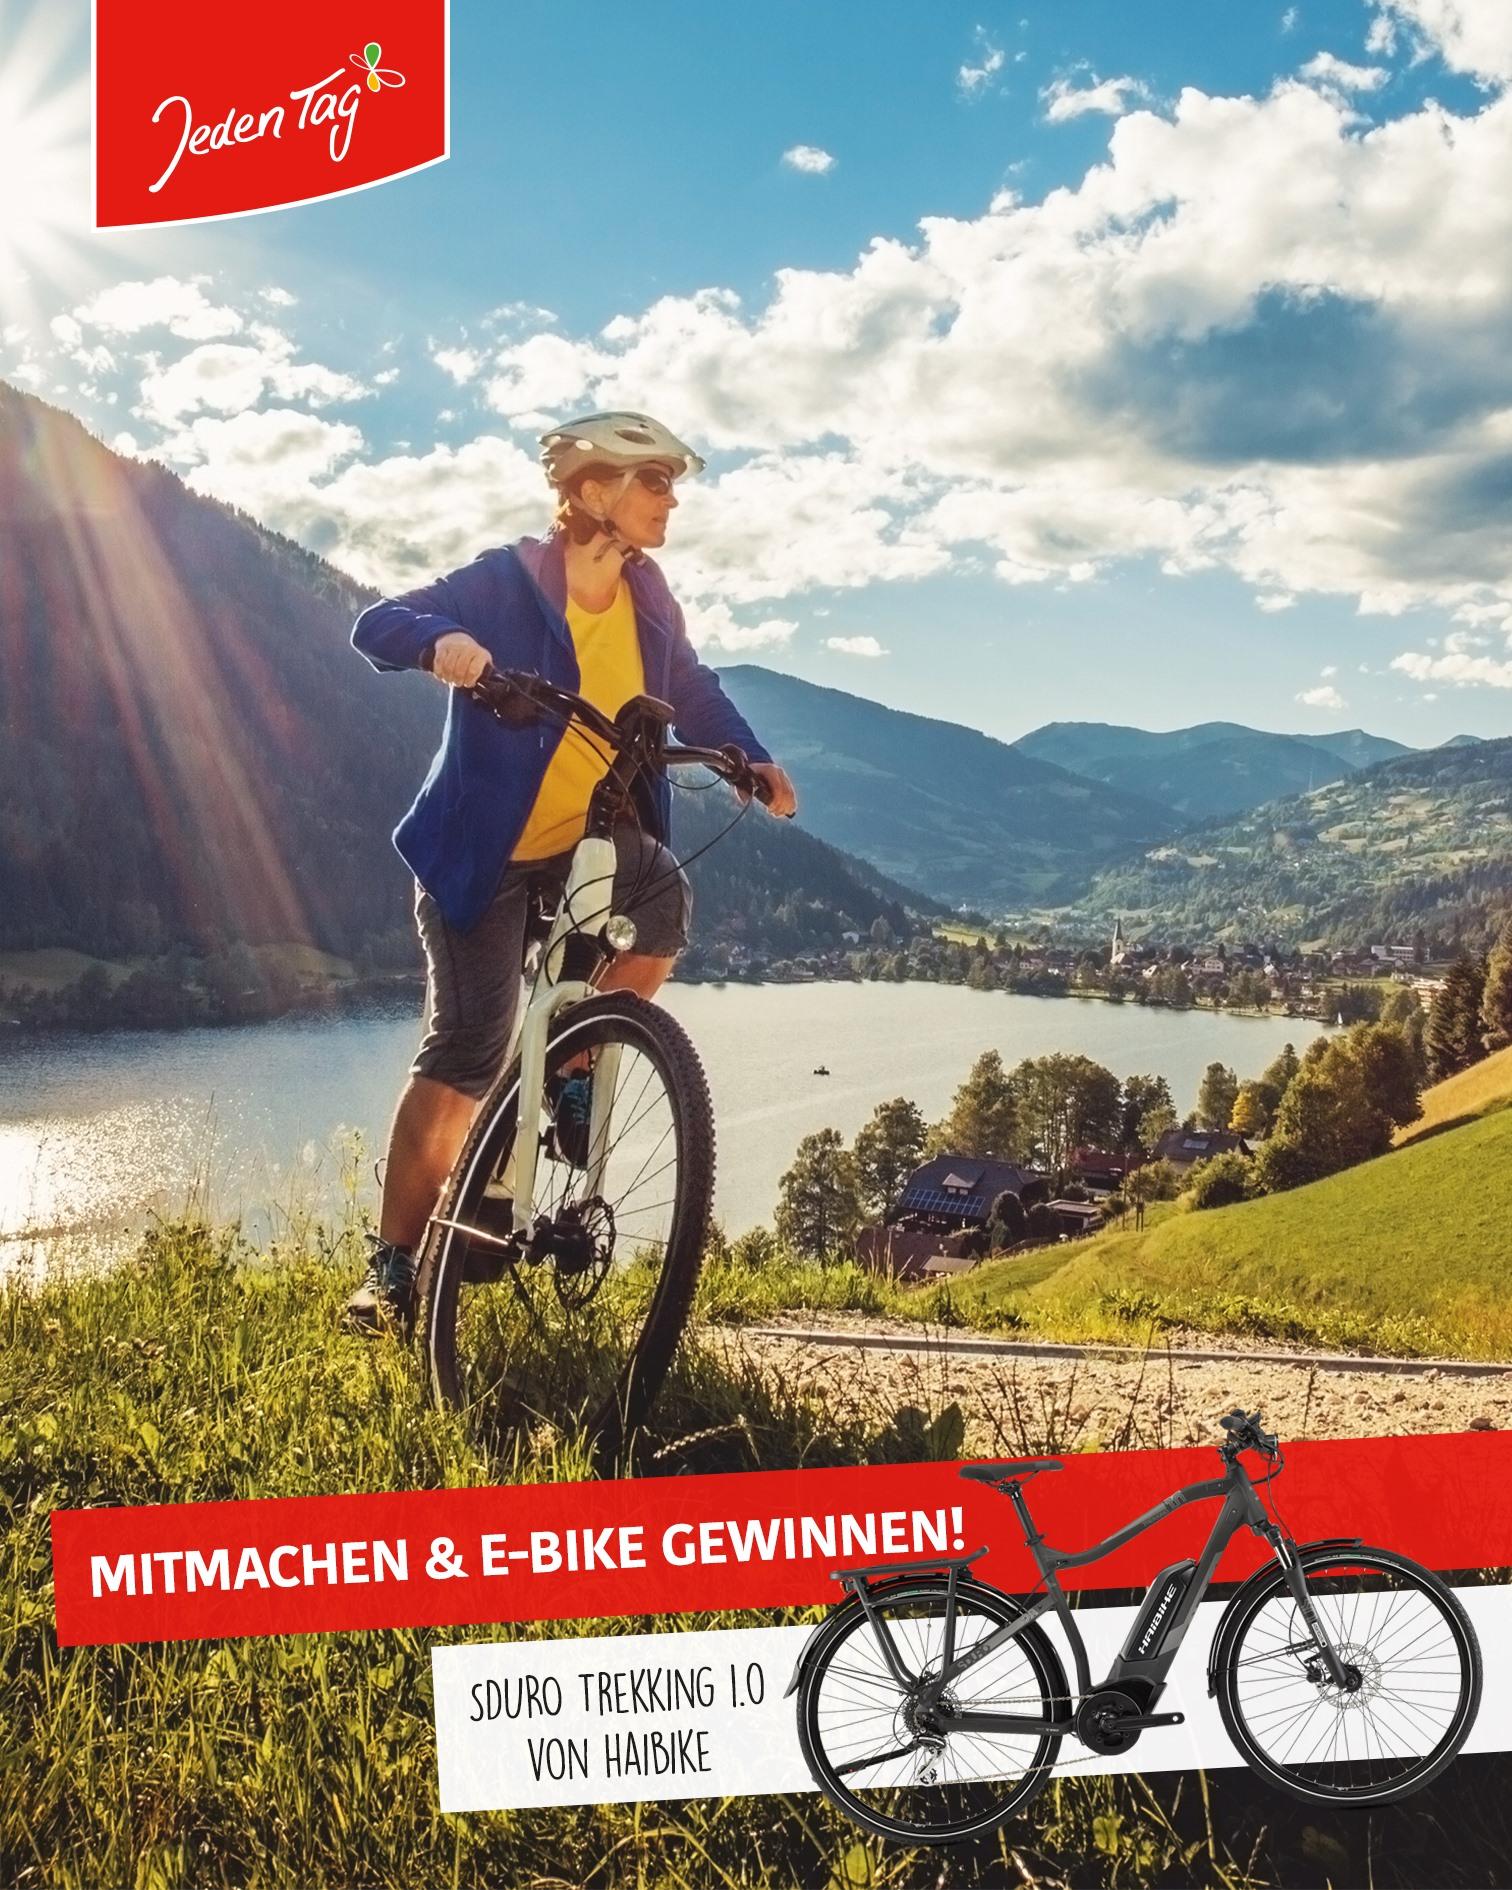 Jeden Tag Gewinnspiel - E-Bike